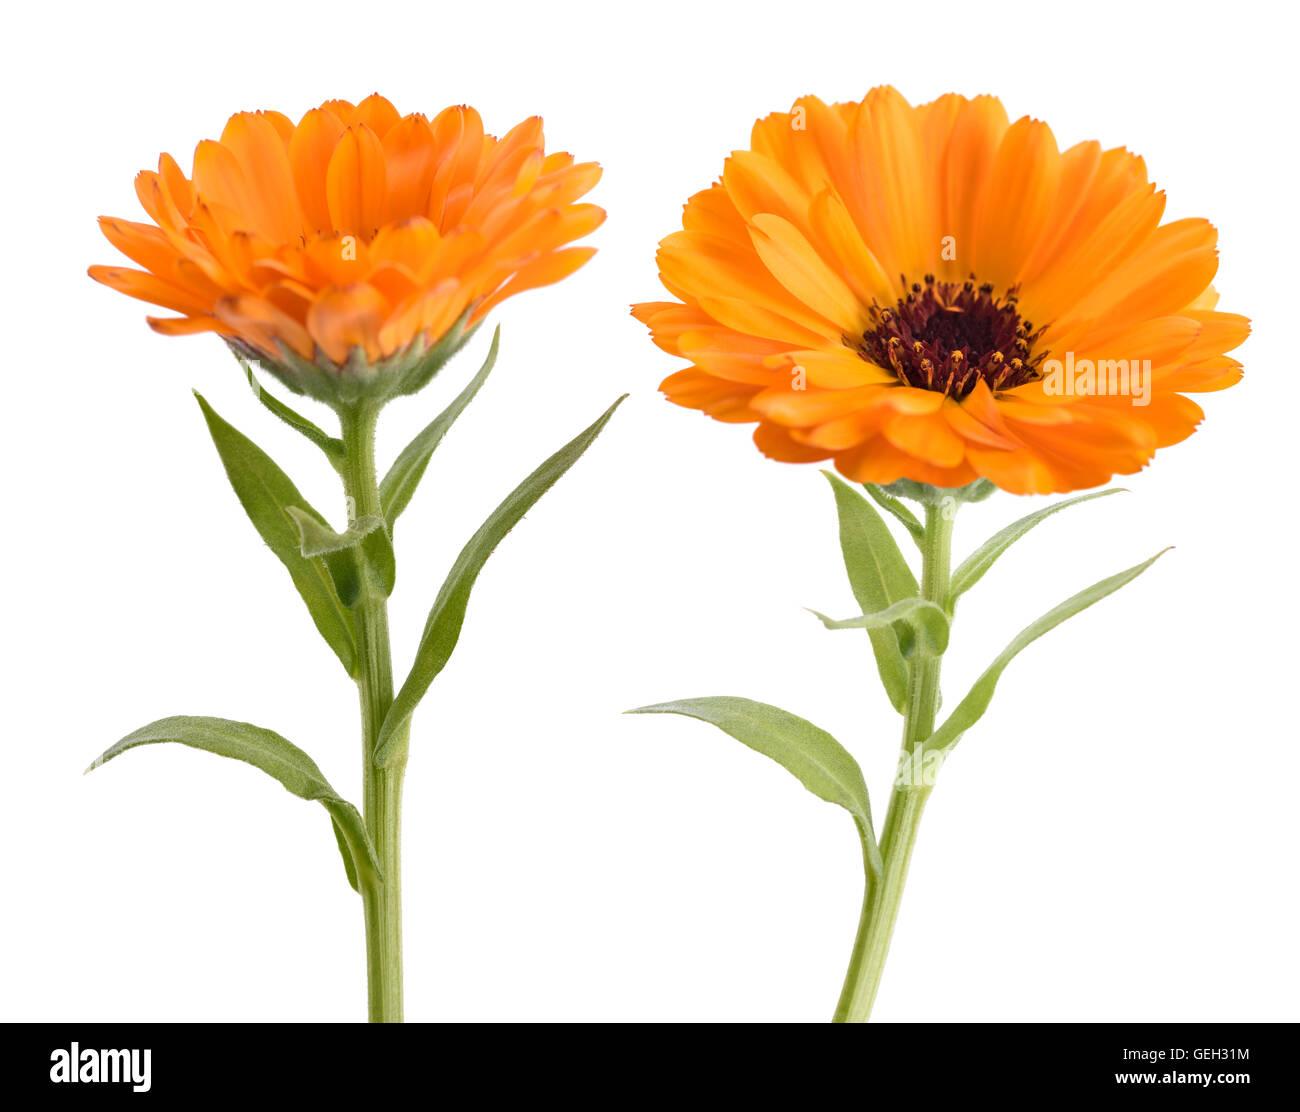 Calendula marigold flowers with leaves isolated on white stock marigold flowers with leaves isolated on white mightylinksfo